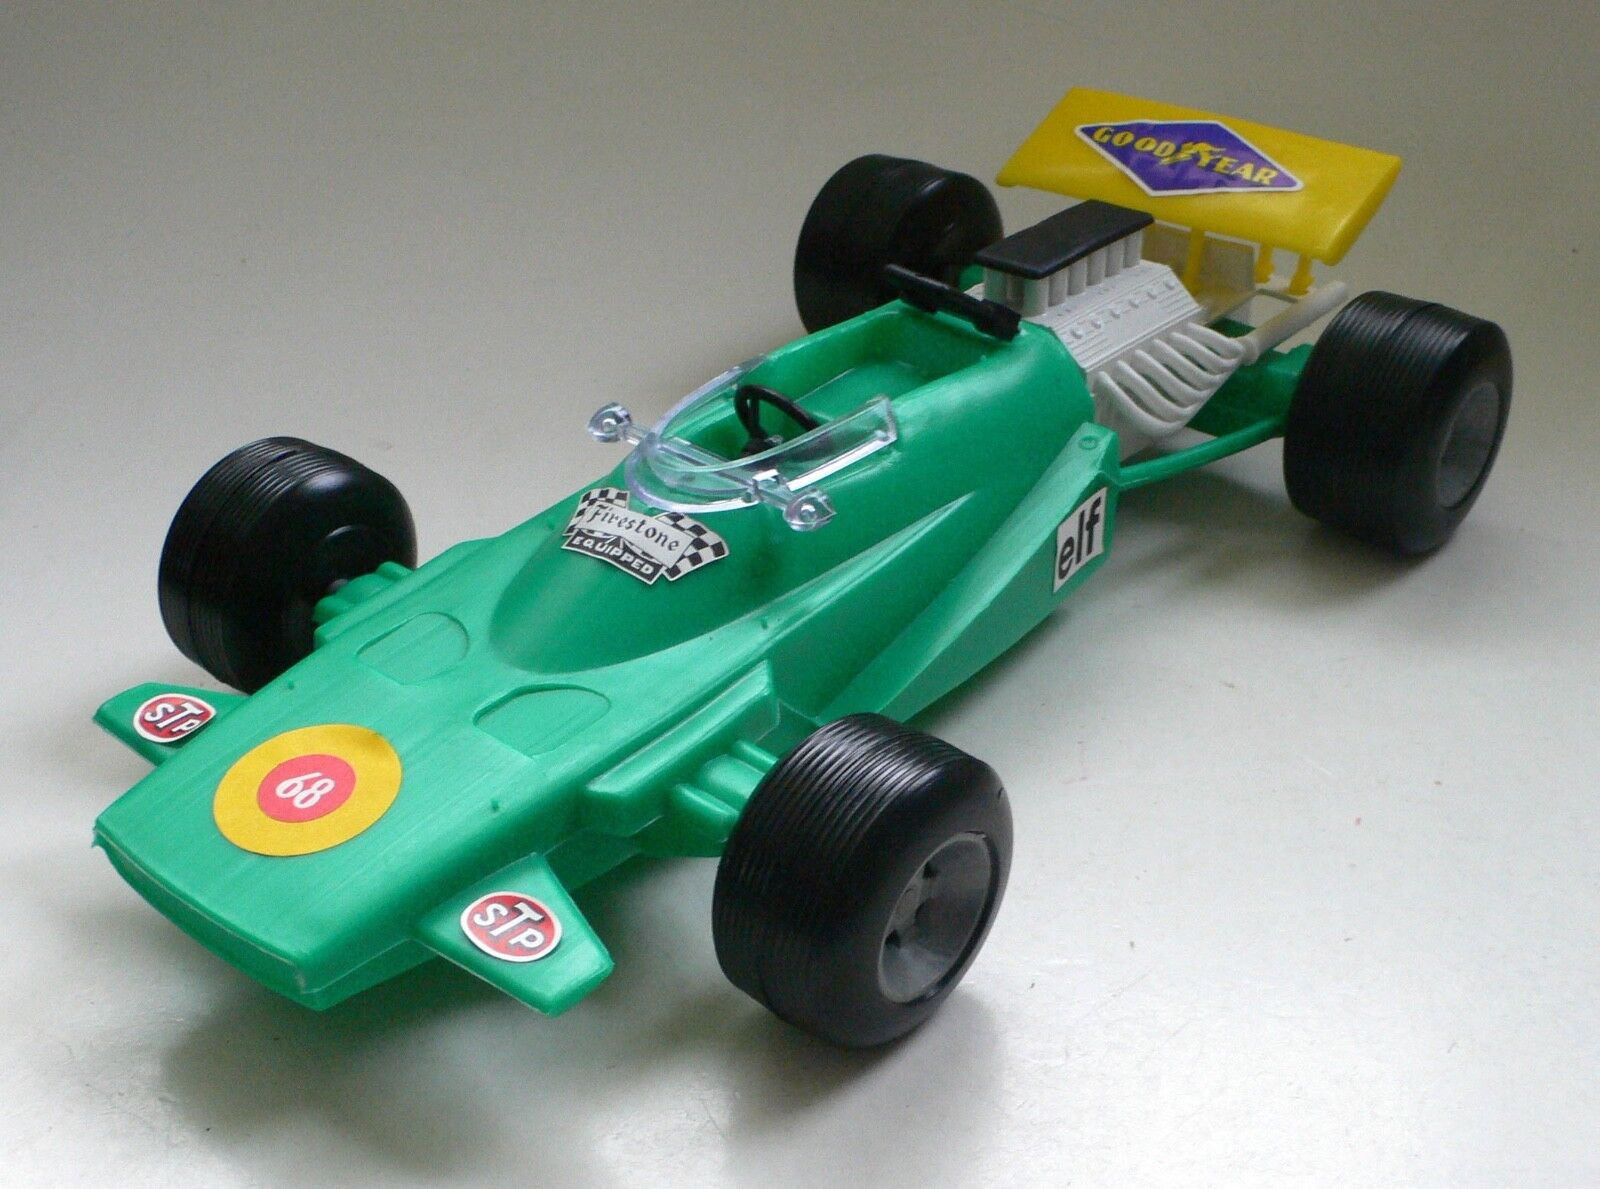 Sogimez 1 14 MATRA MS 120 Monaco GP FORMULE 1 Race Bilmodellll Grön 1971 37cm